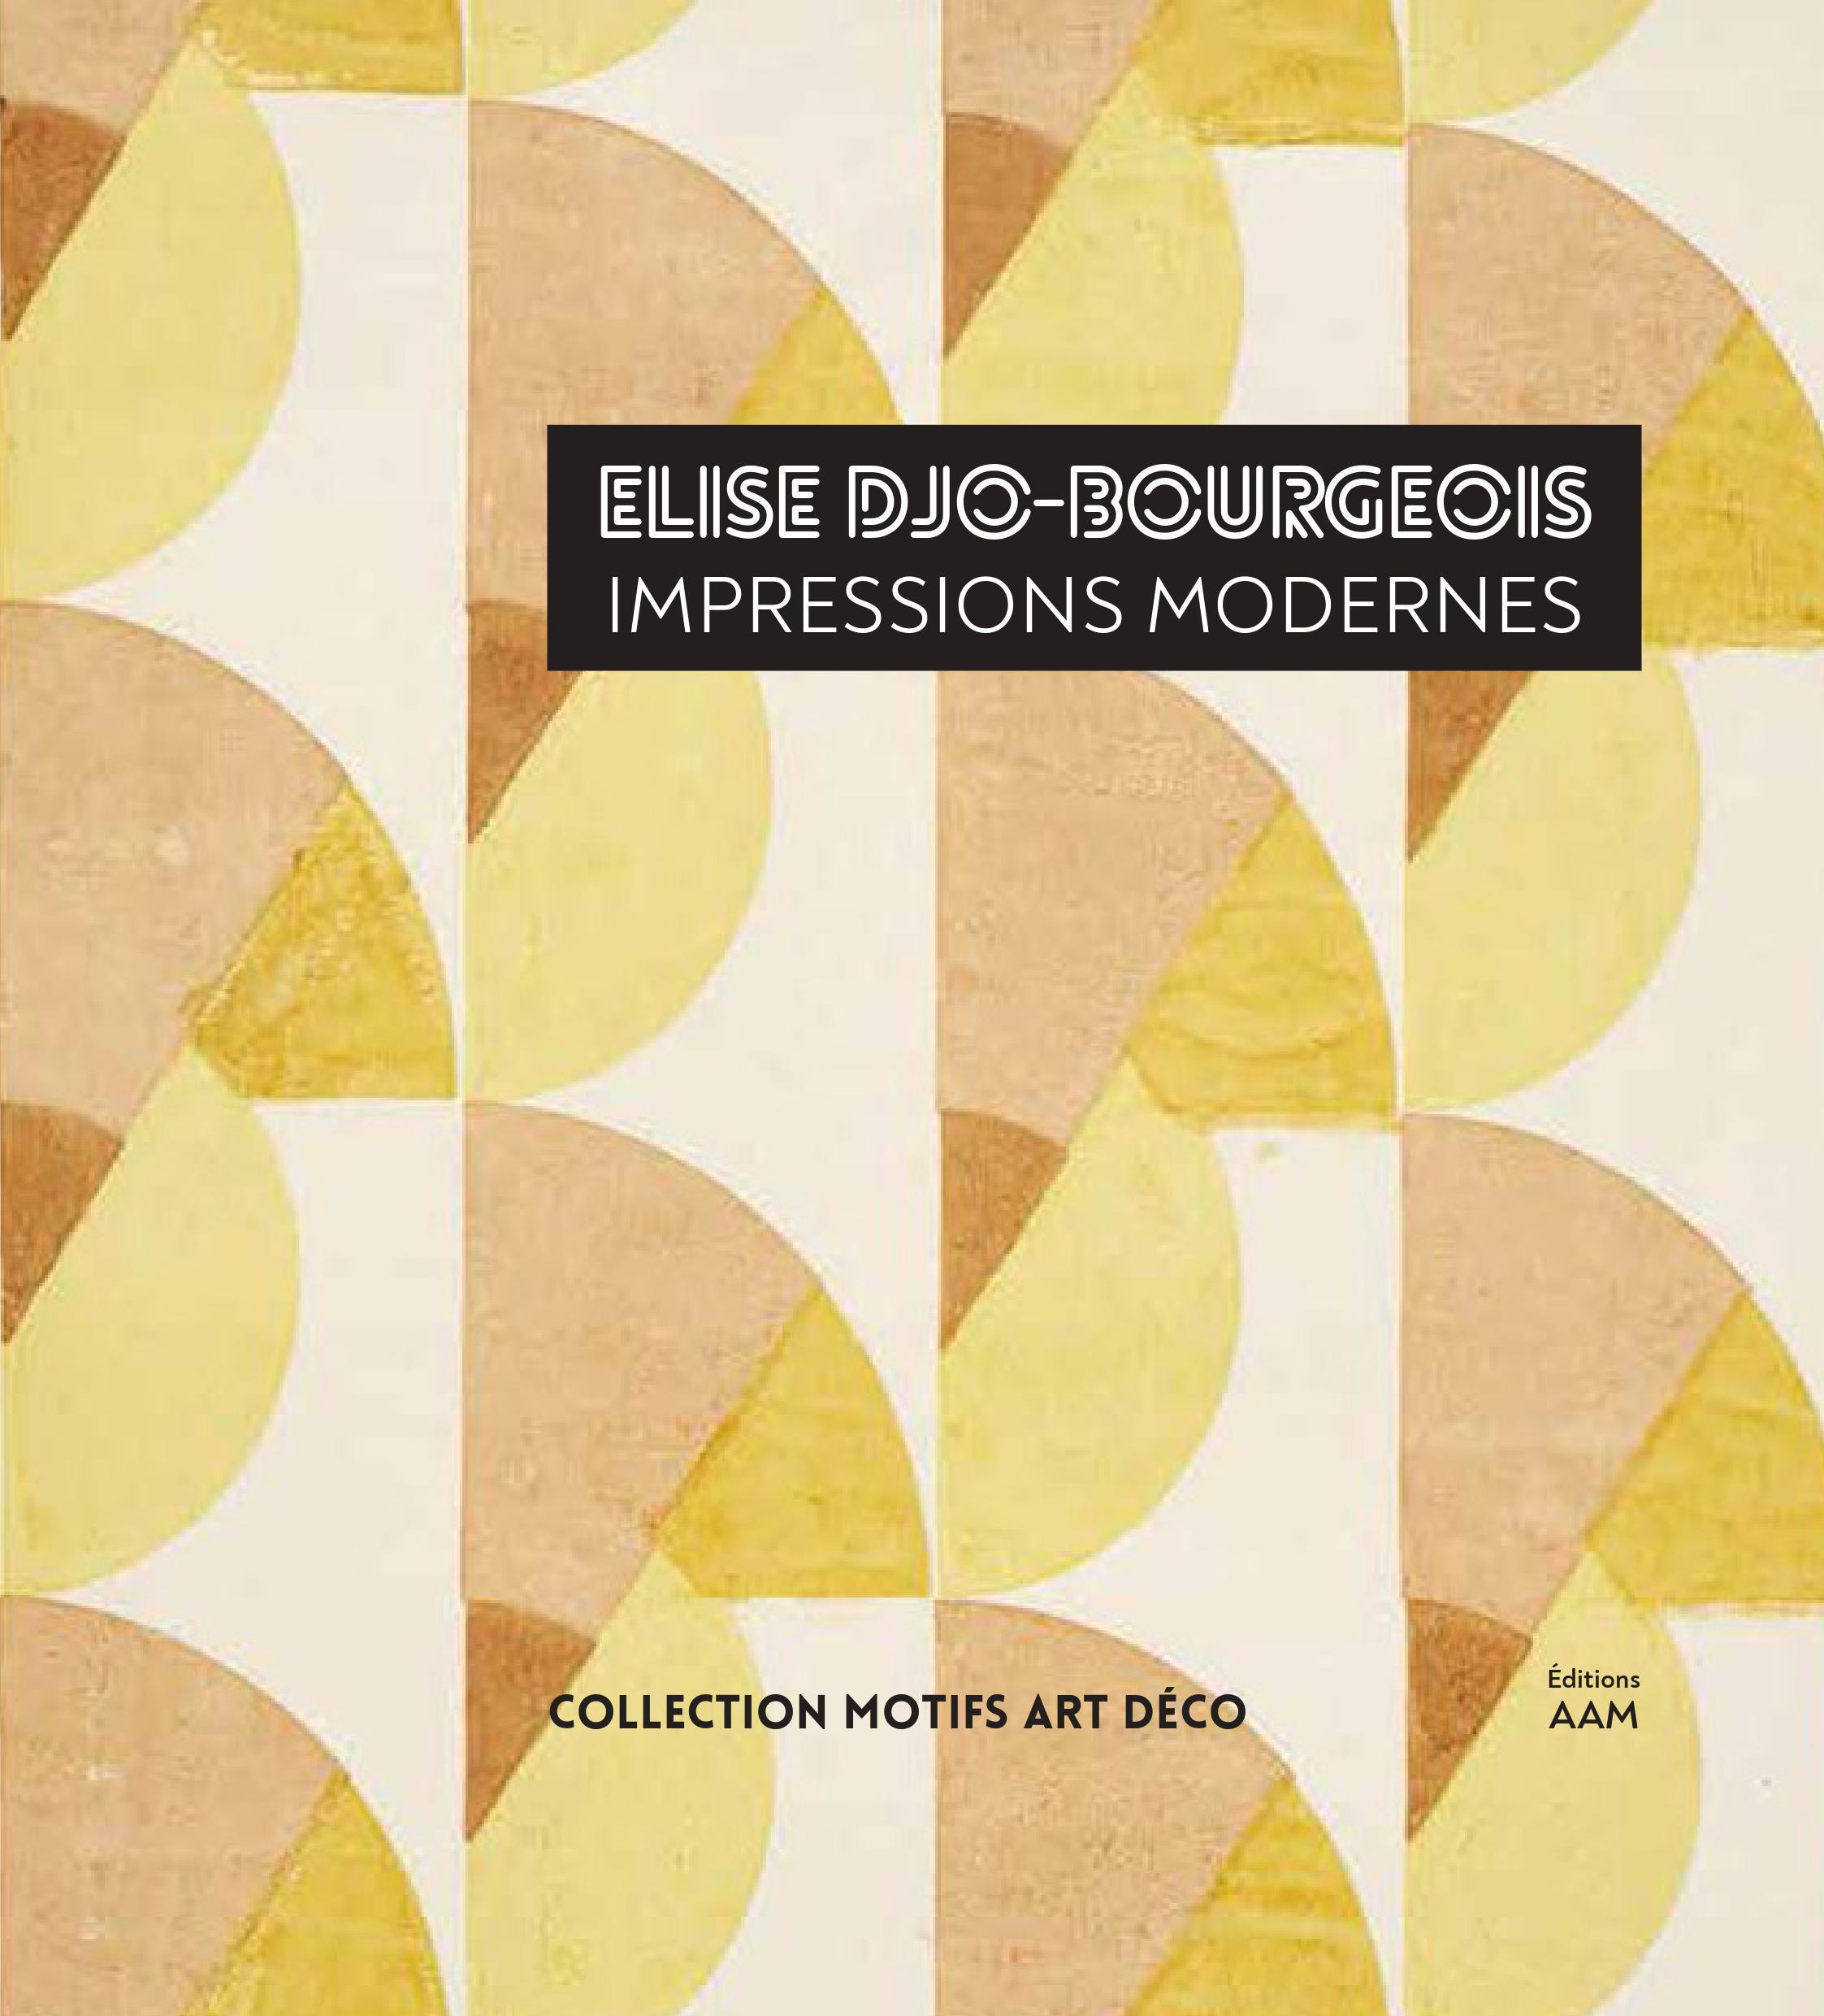 ELISE DJO-BOURGEOIS IMPRESSIONS MODERNES - 1926 - 1936